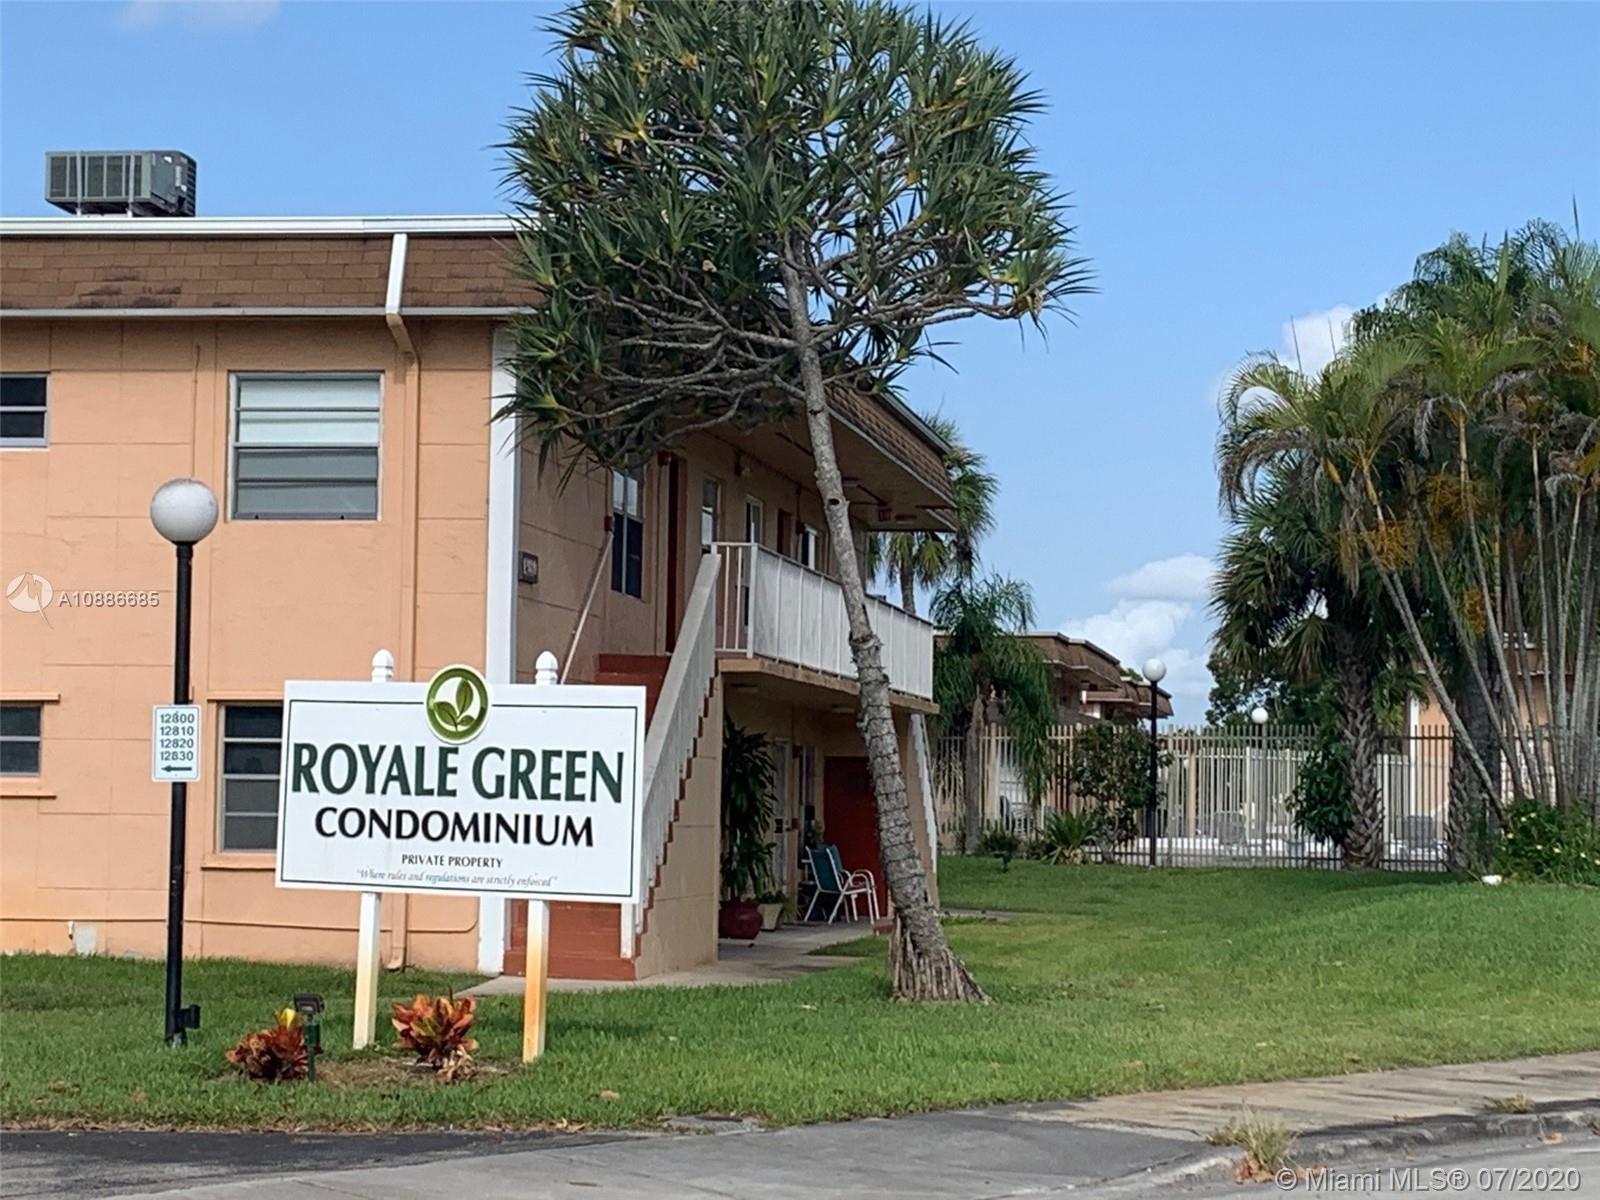 12831 SW 43rd Dr #149-A, Miami, FL 33175 - #: A10886685